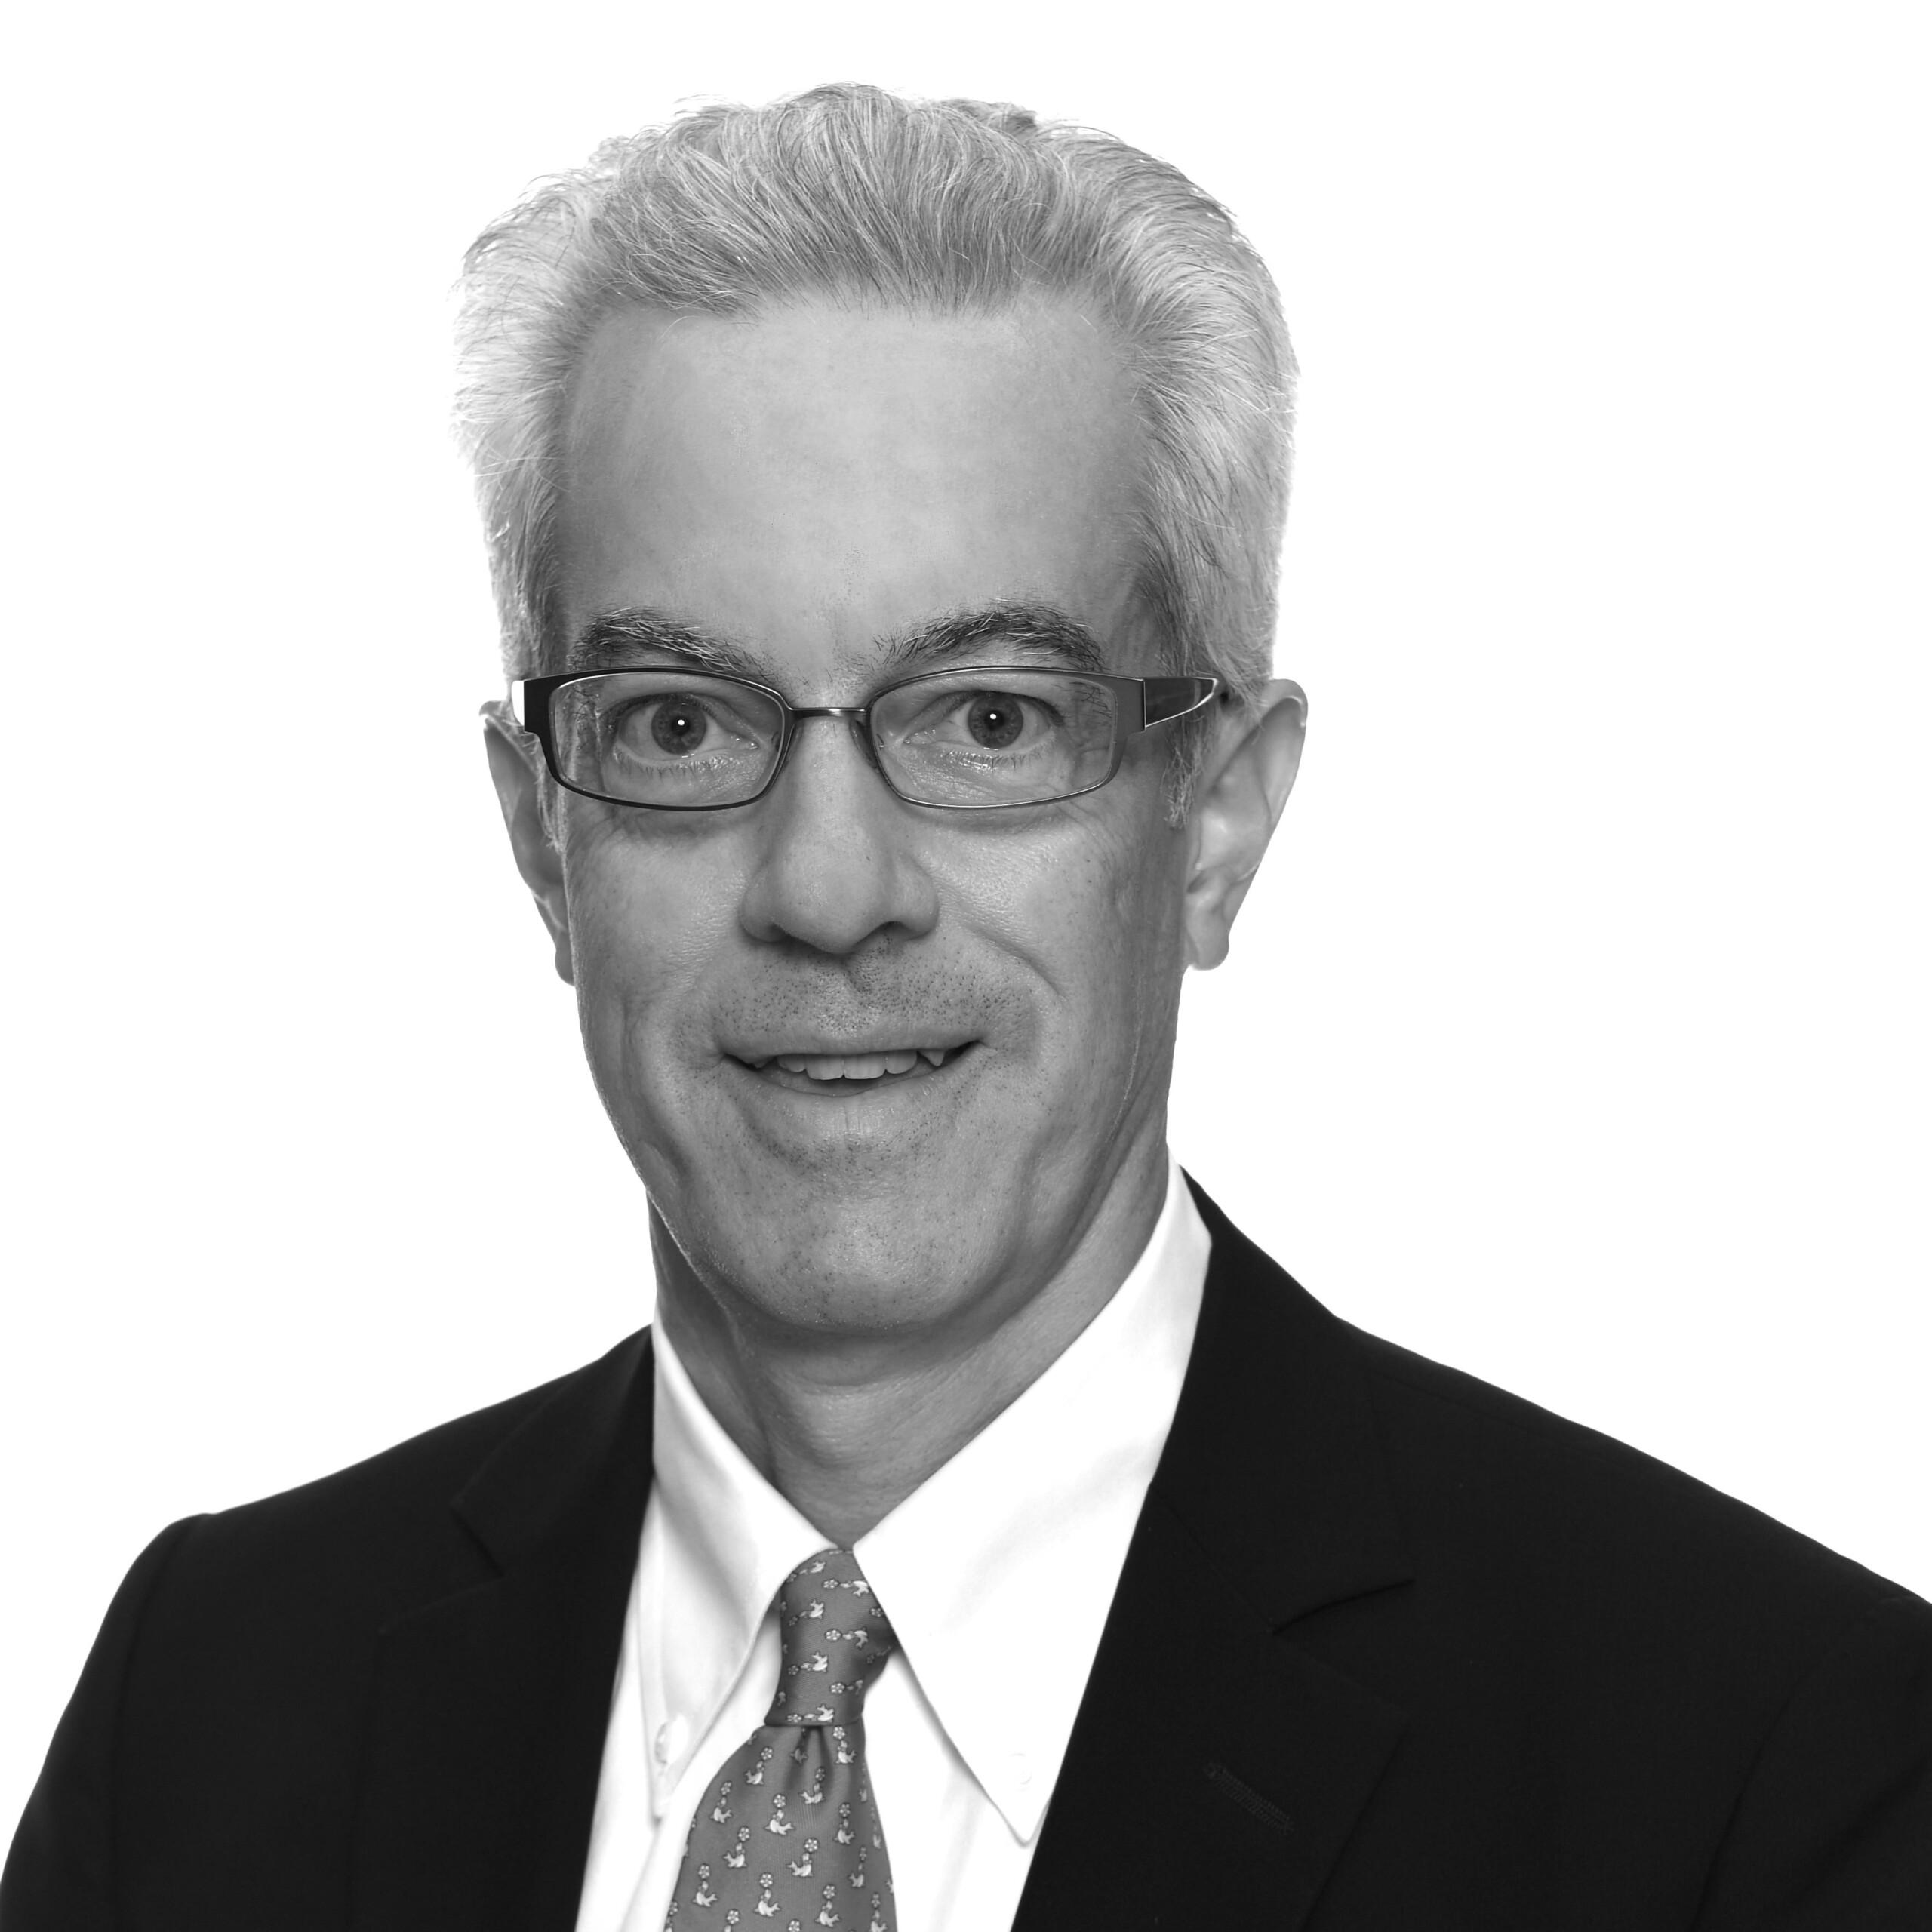 David E. McGinnis, MD